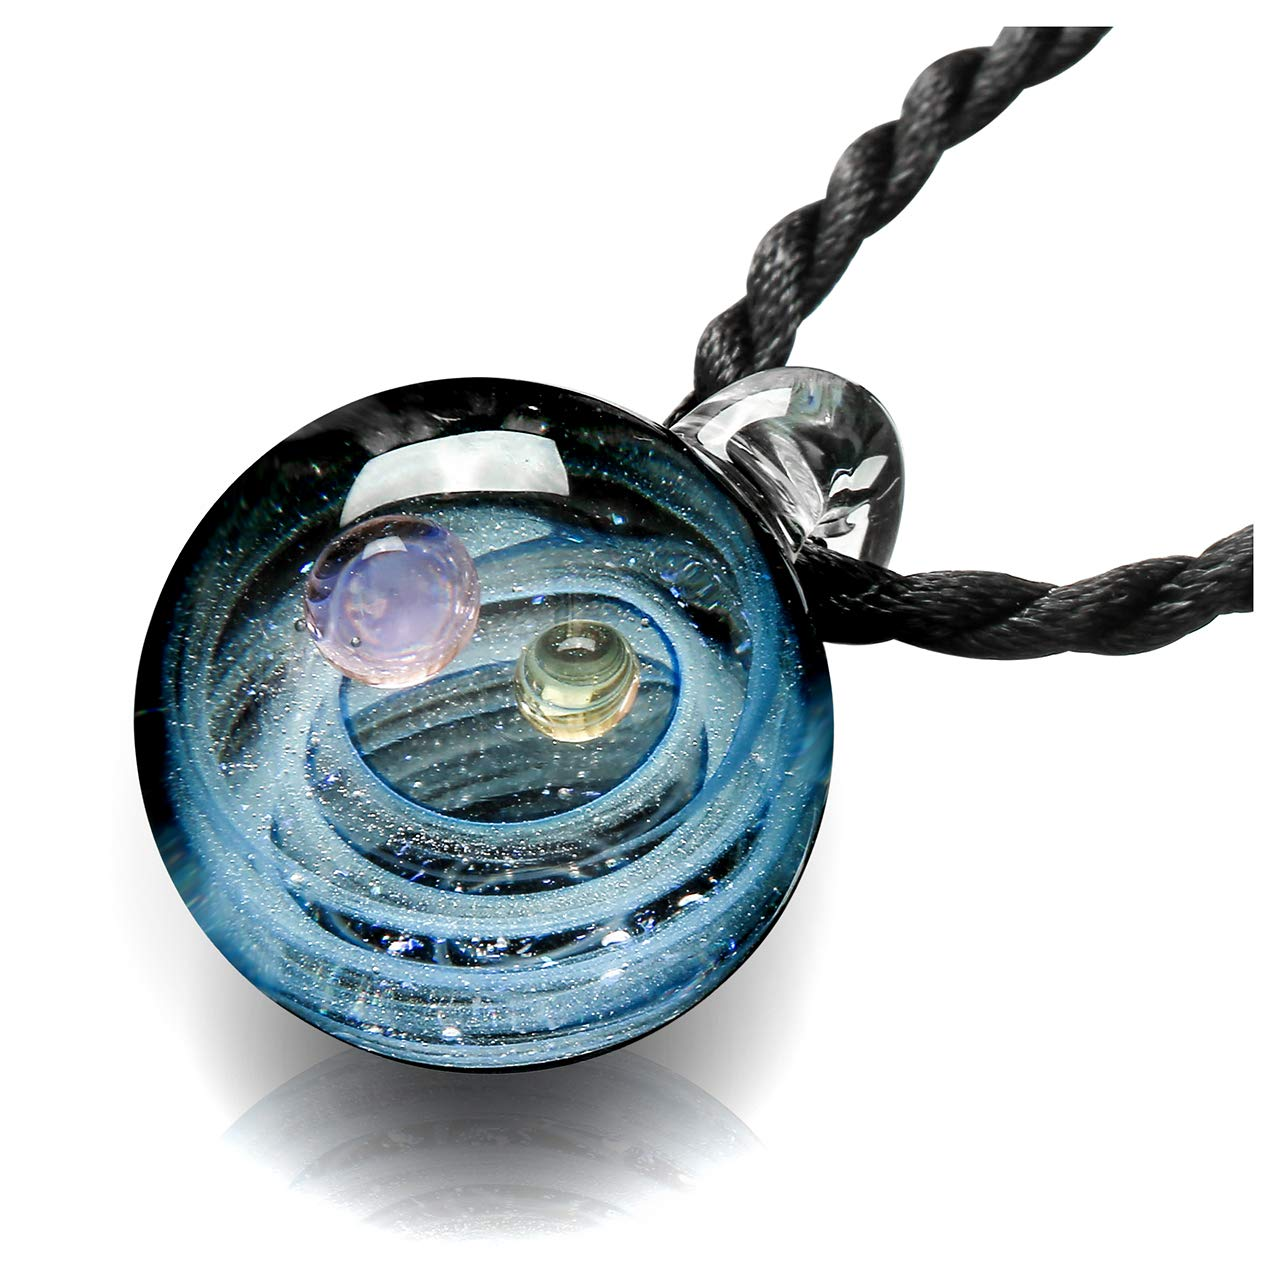 JOVIVI Schmuck Damen 3D Kugel Lampwork Glas Anhänger Halskette Universum Galaxie Nebel Planet Pendant mit 2 Ketten TTDE000745